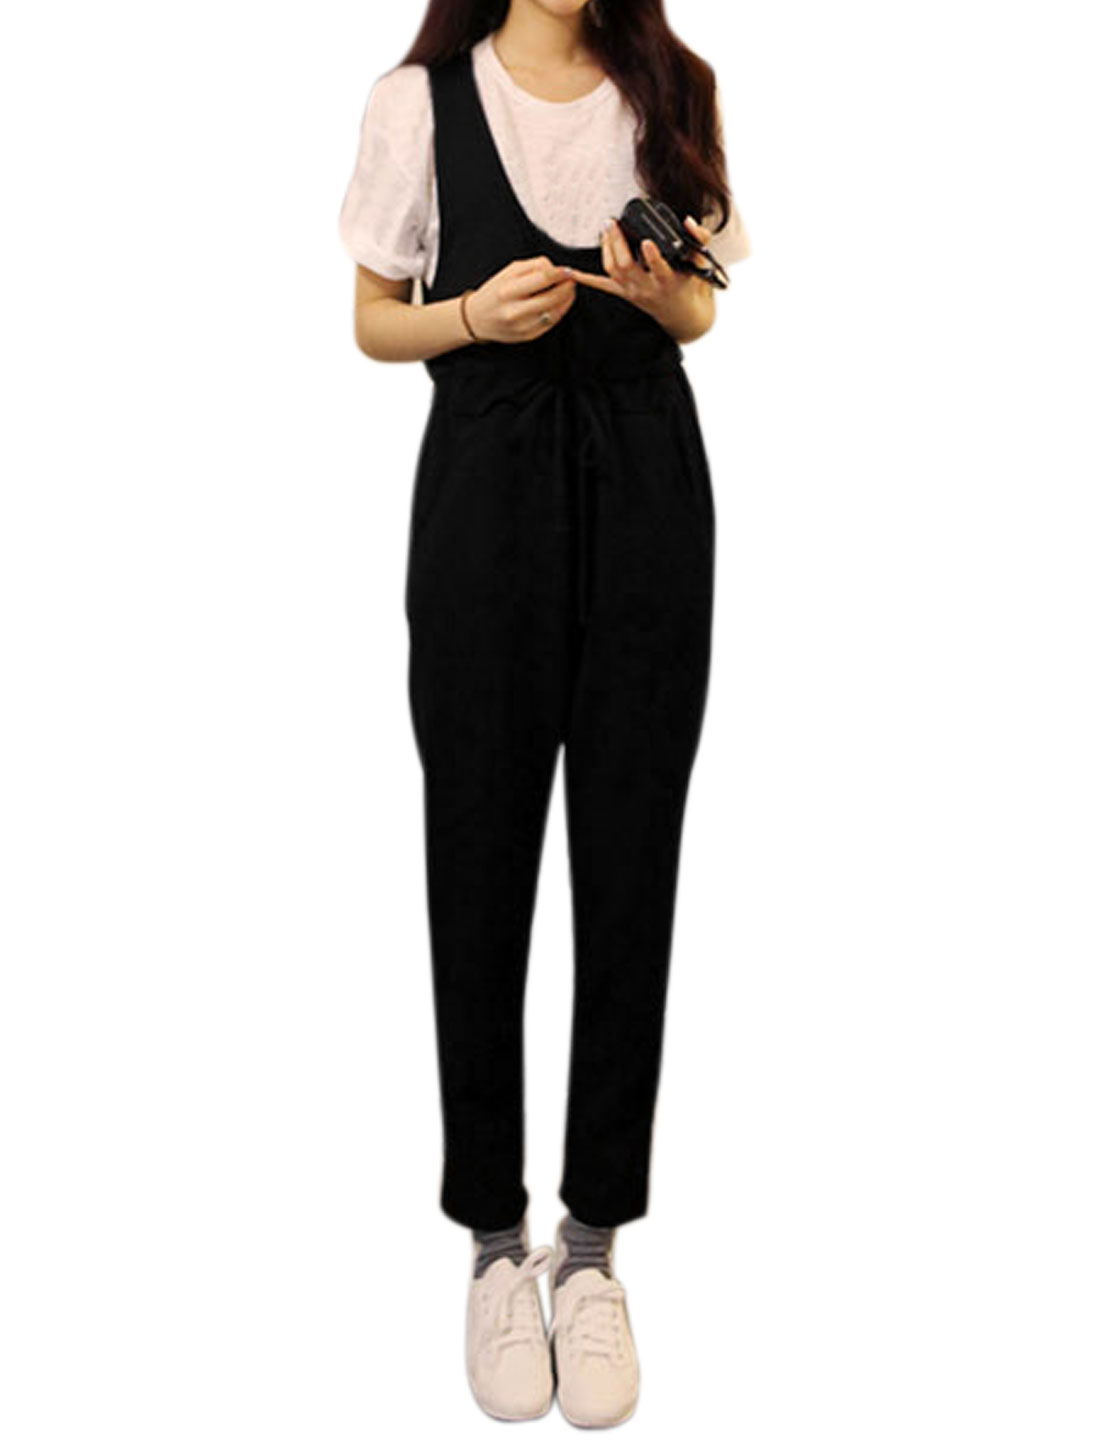 Women Drawstring Elastic Waist Slant Pockets Suspender Pants Black XS